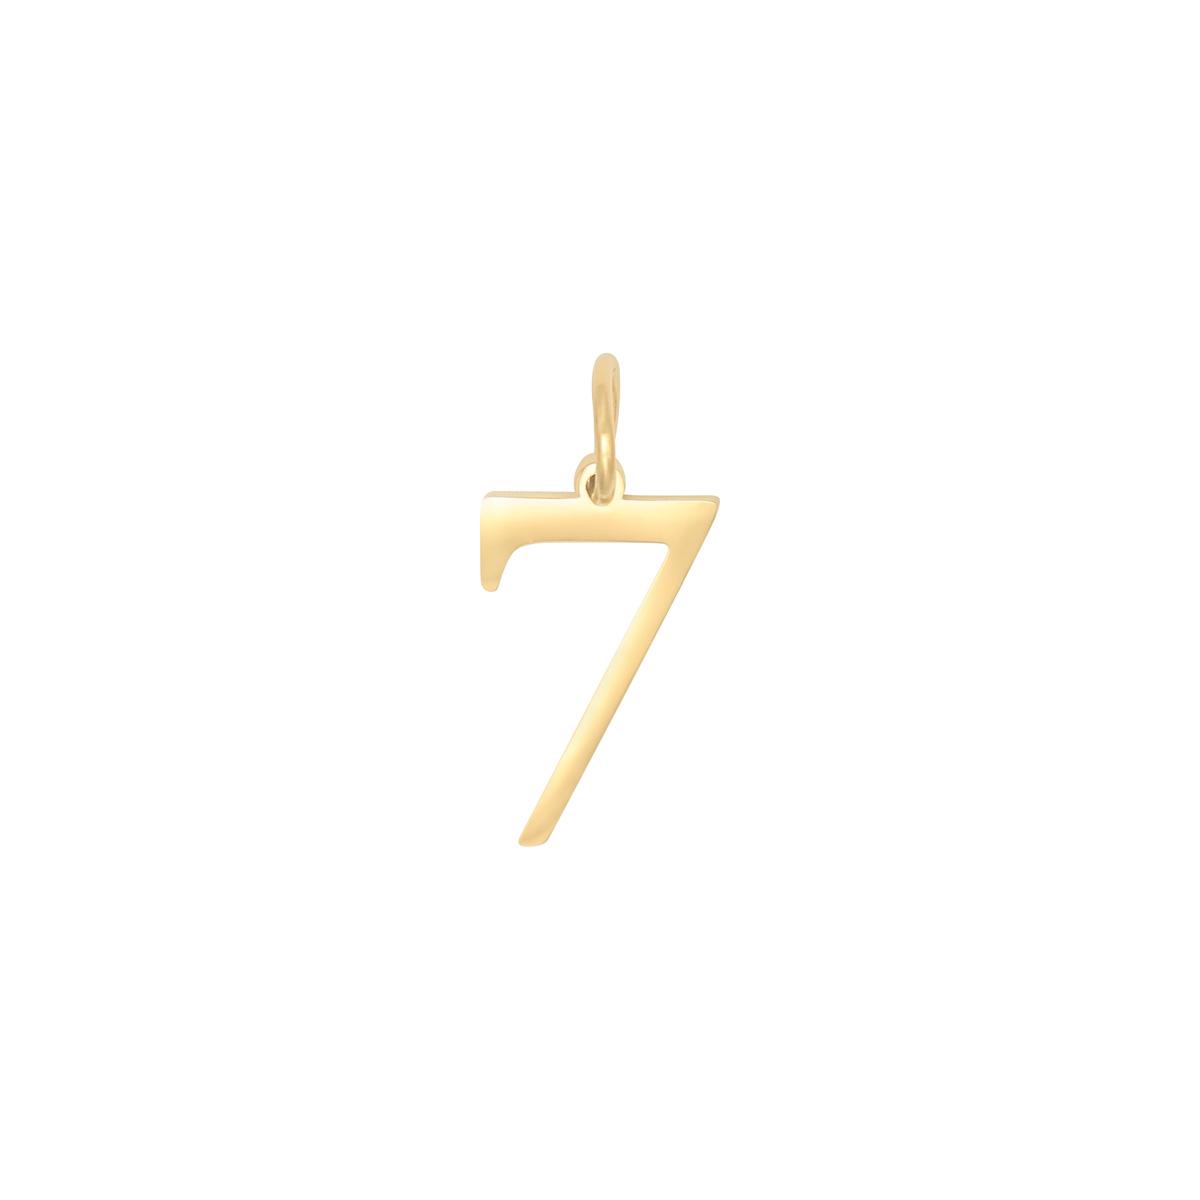 Diy charm digits gold - 2